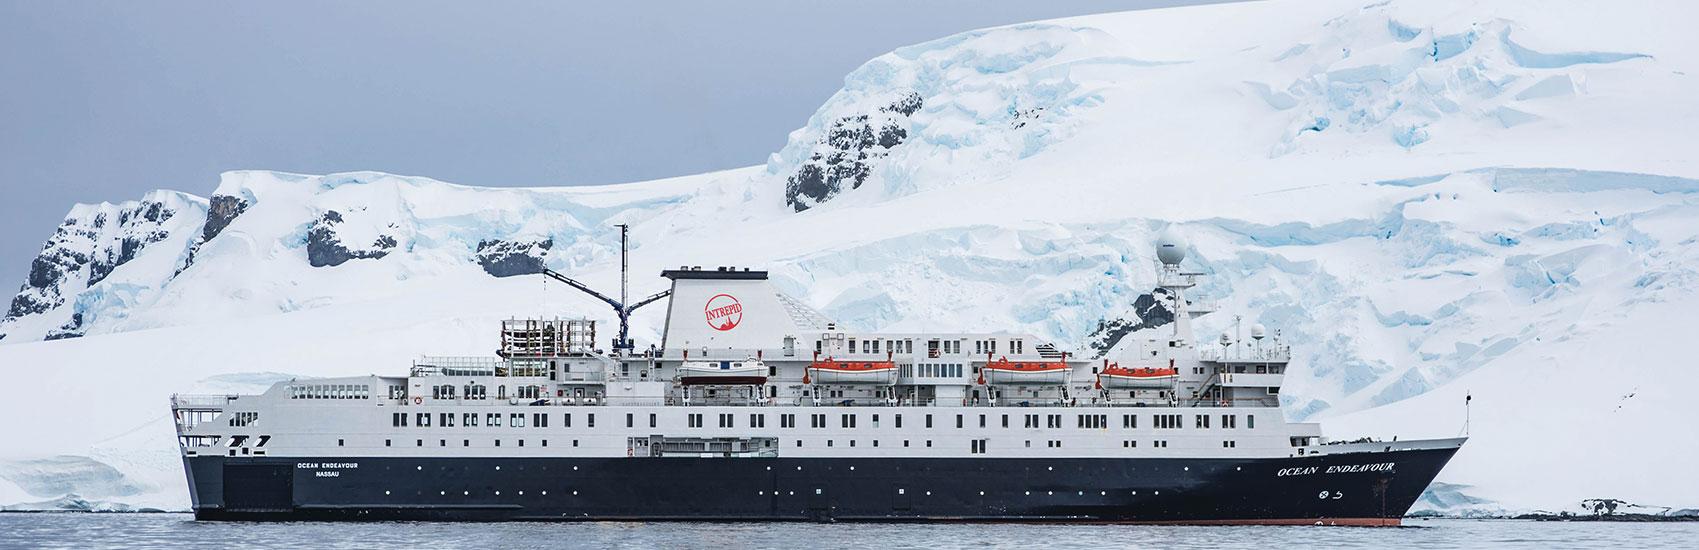 Savings to Antarctica with Intrepid Travel 2